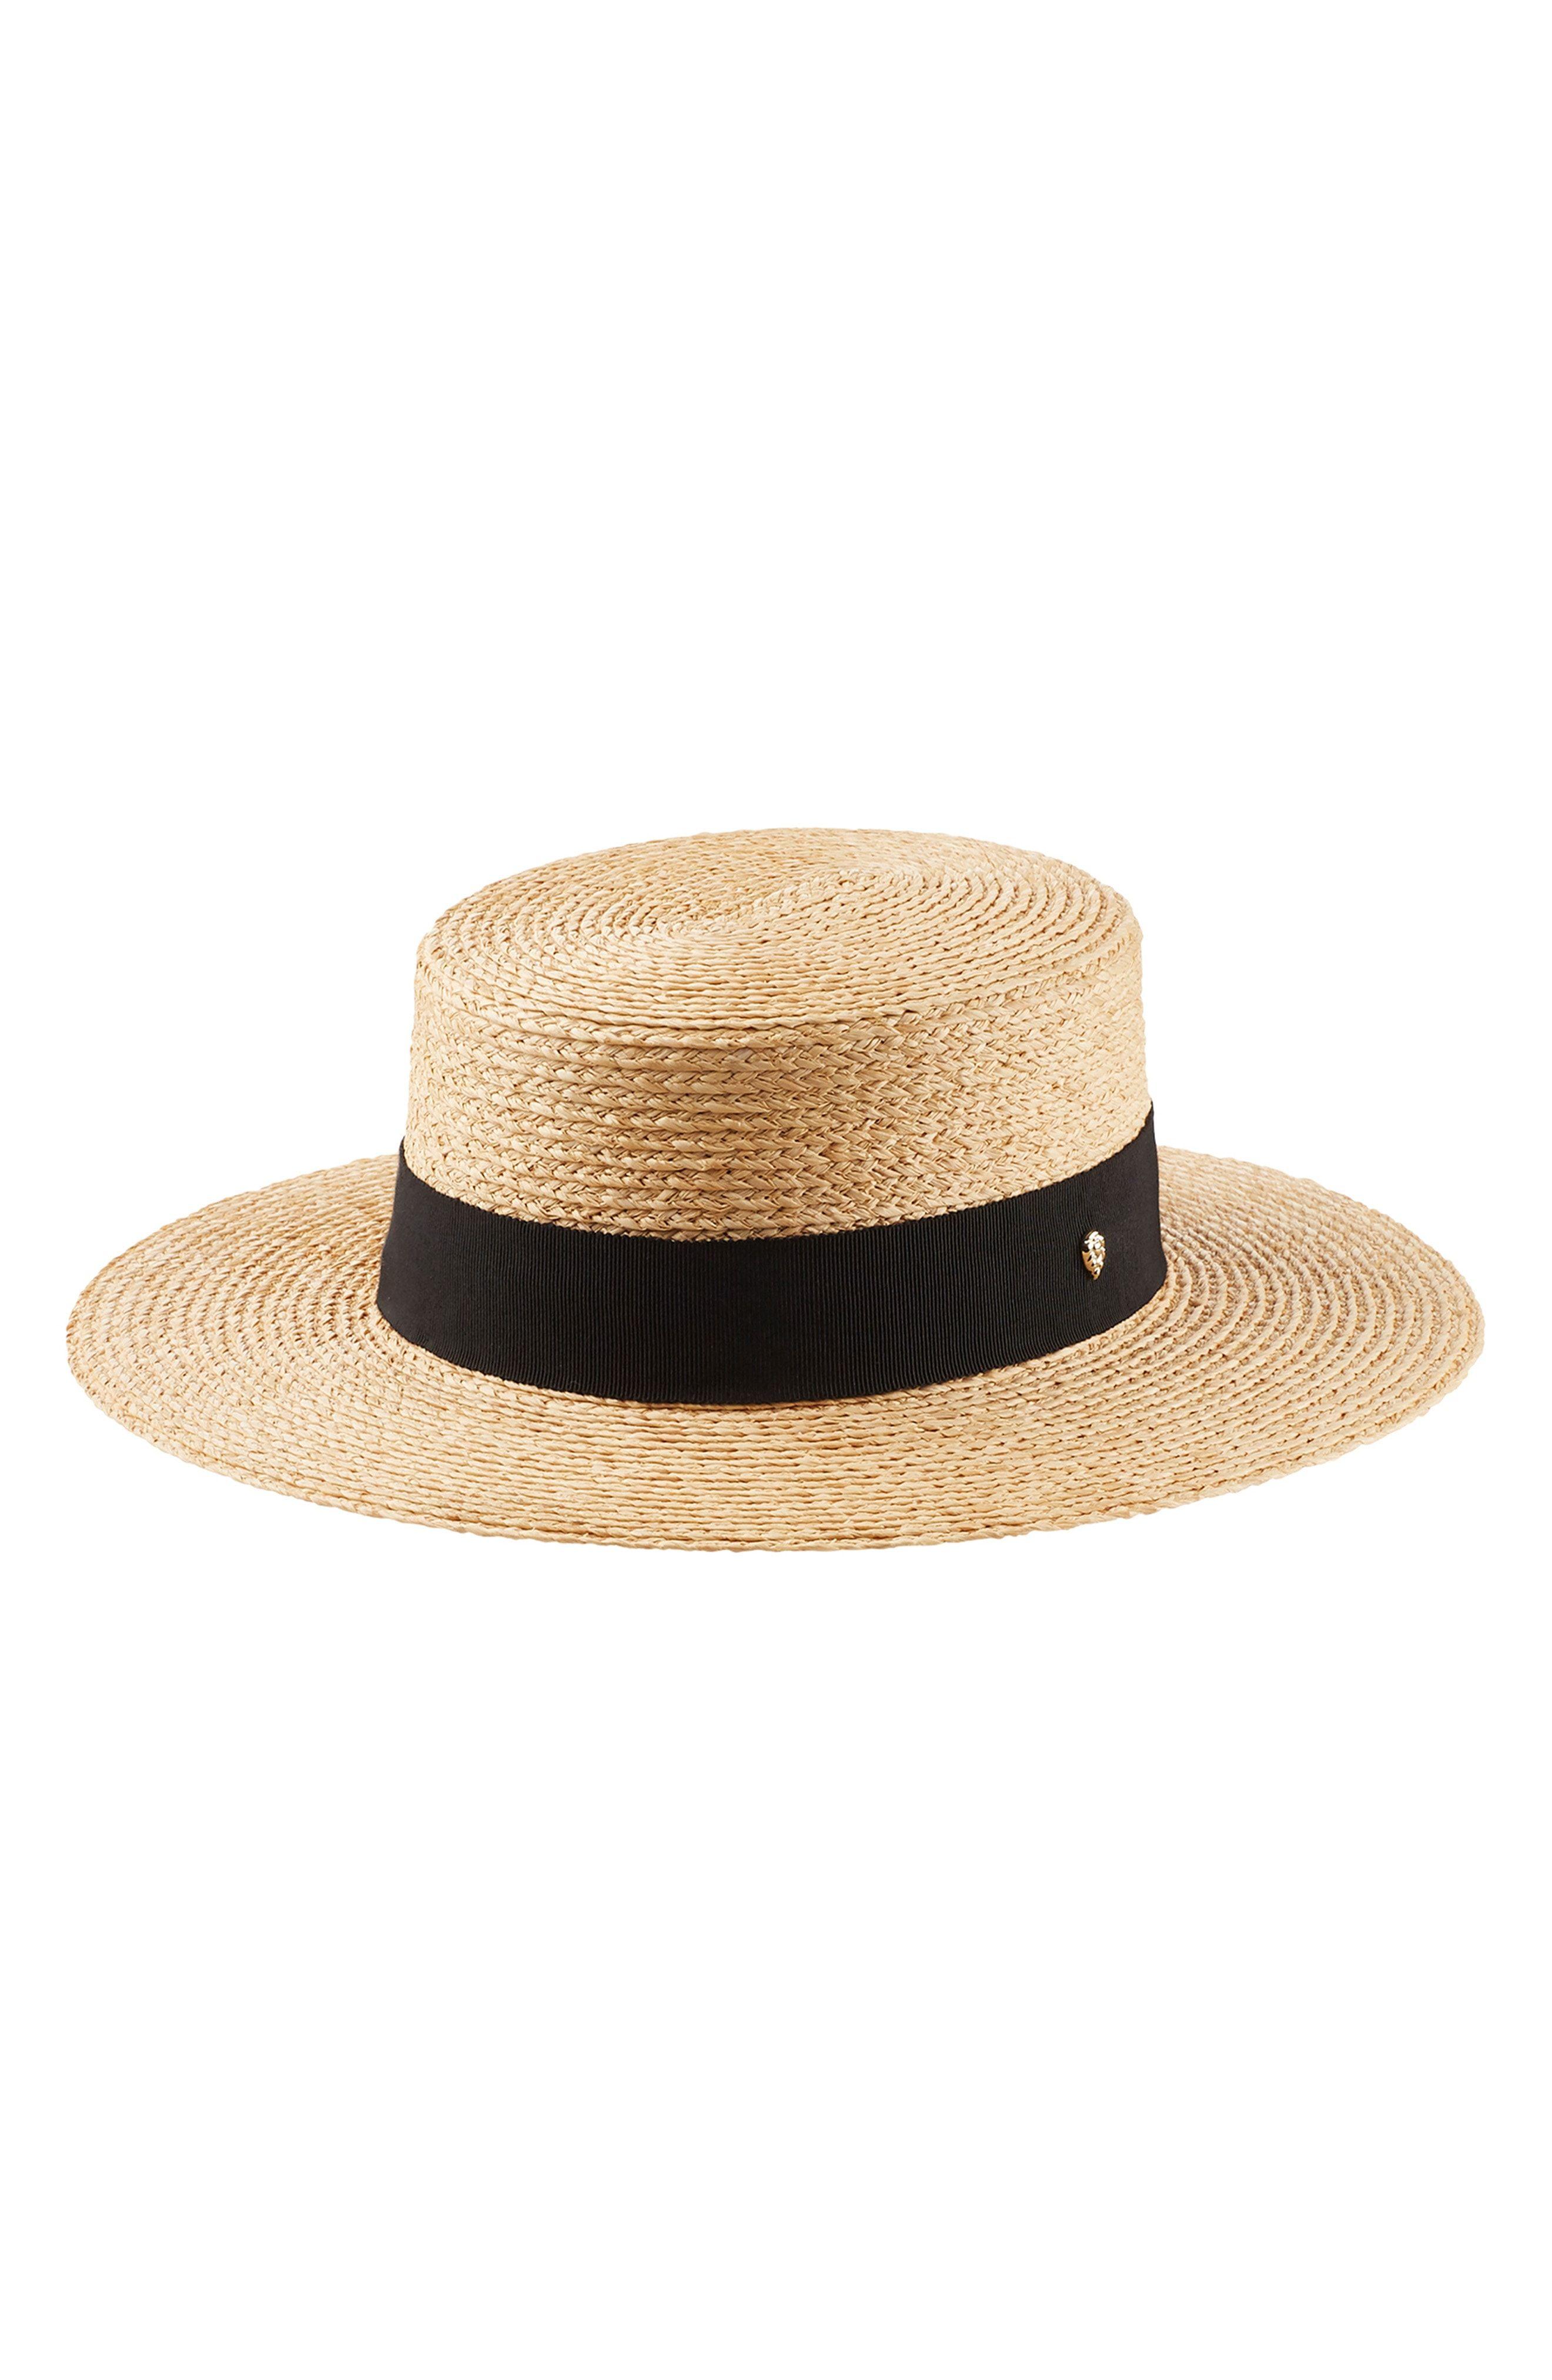 22ffe96b965d HELEN KAMINSKI RAFFIA BOATER HAT - BROWN. #helenkaminski   Helen ...